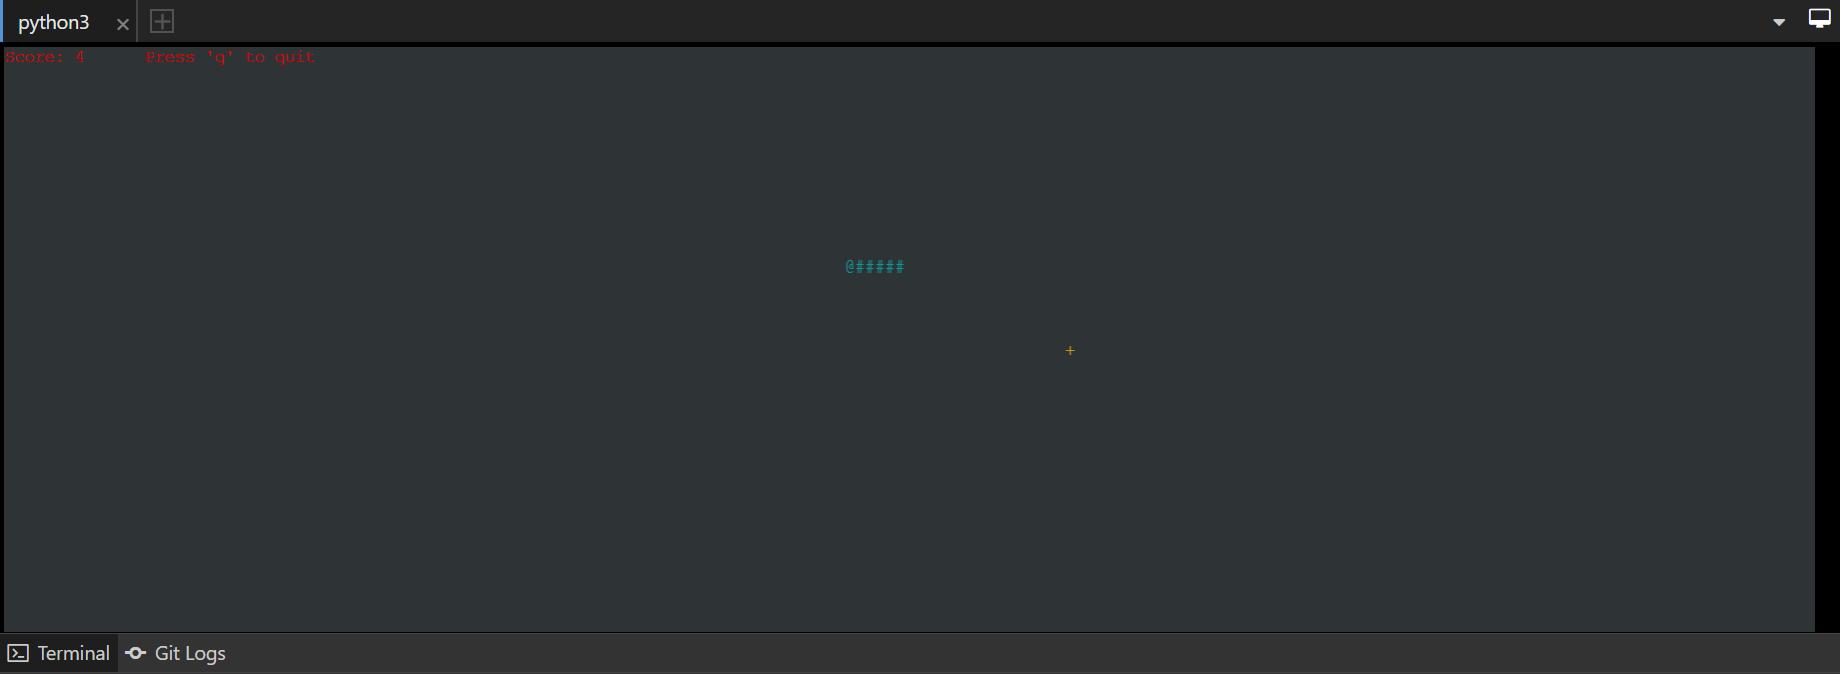 Python 3 Demo